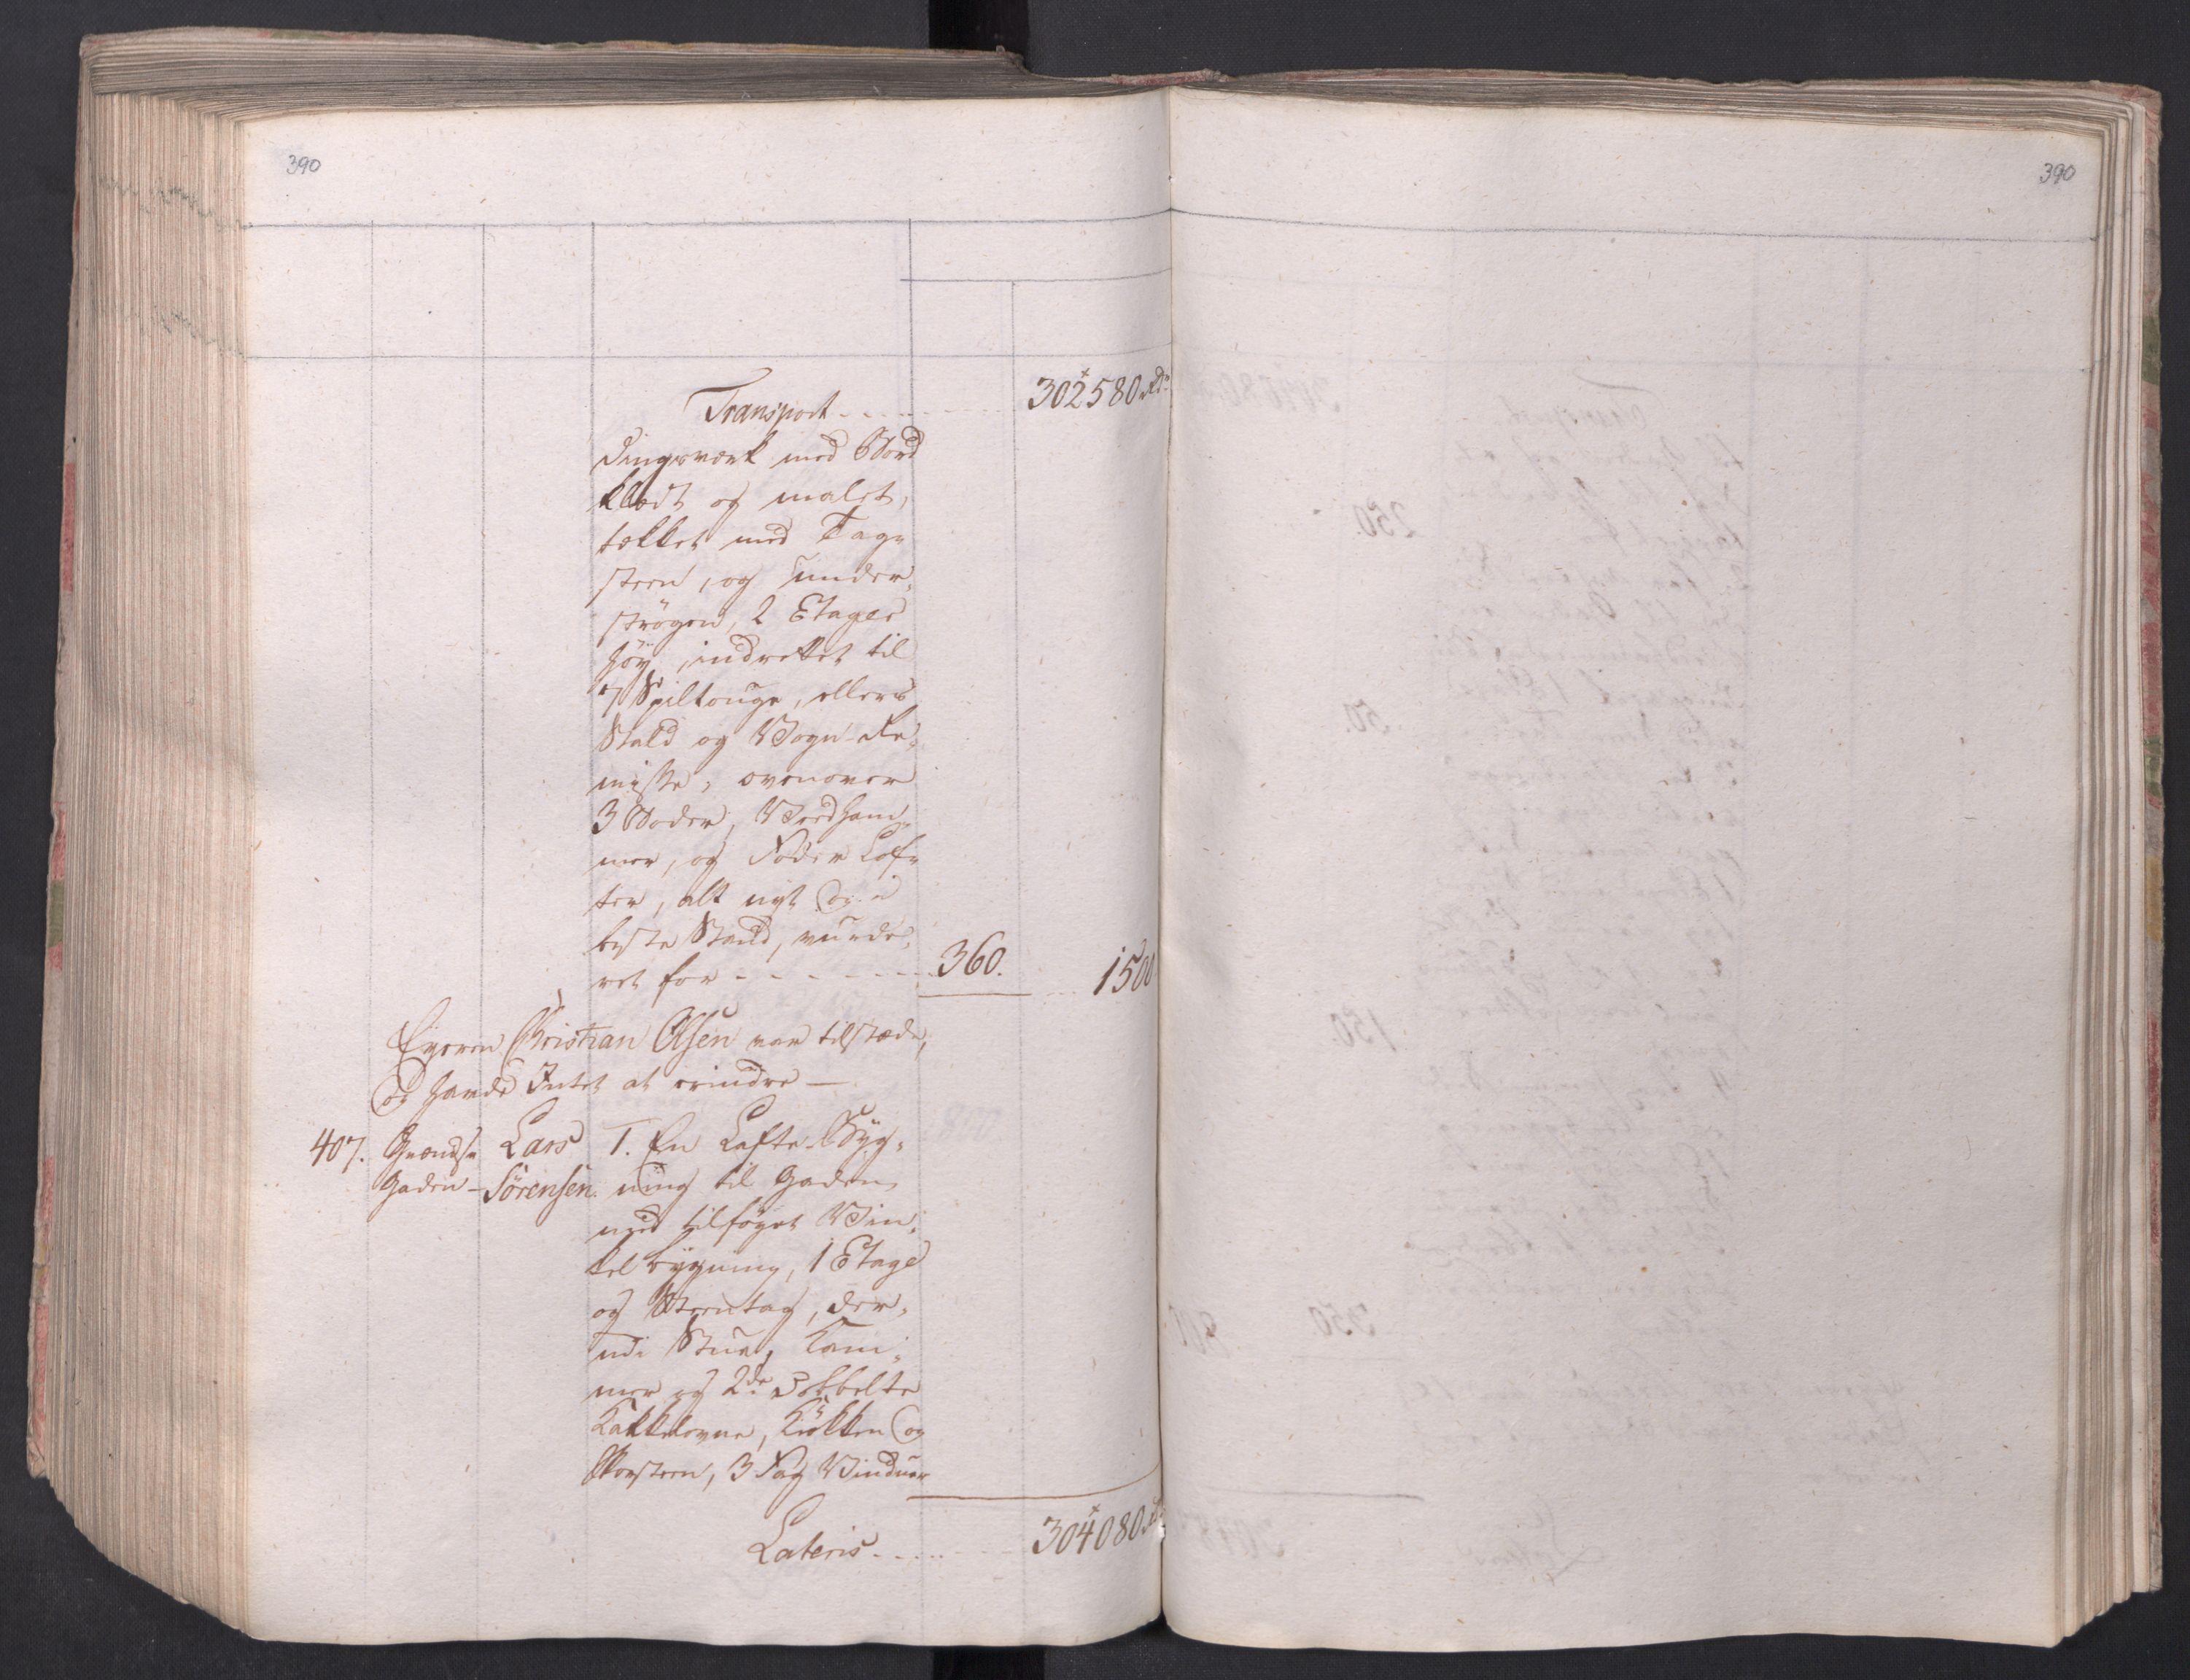 SAO, Kristiania stiftamt, I/Ia/L0015: Branntakster, 1797, s. 390